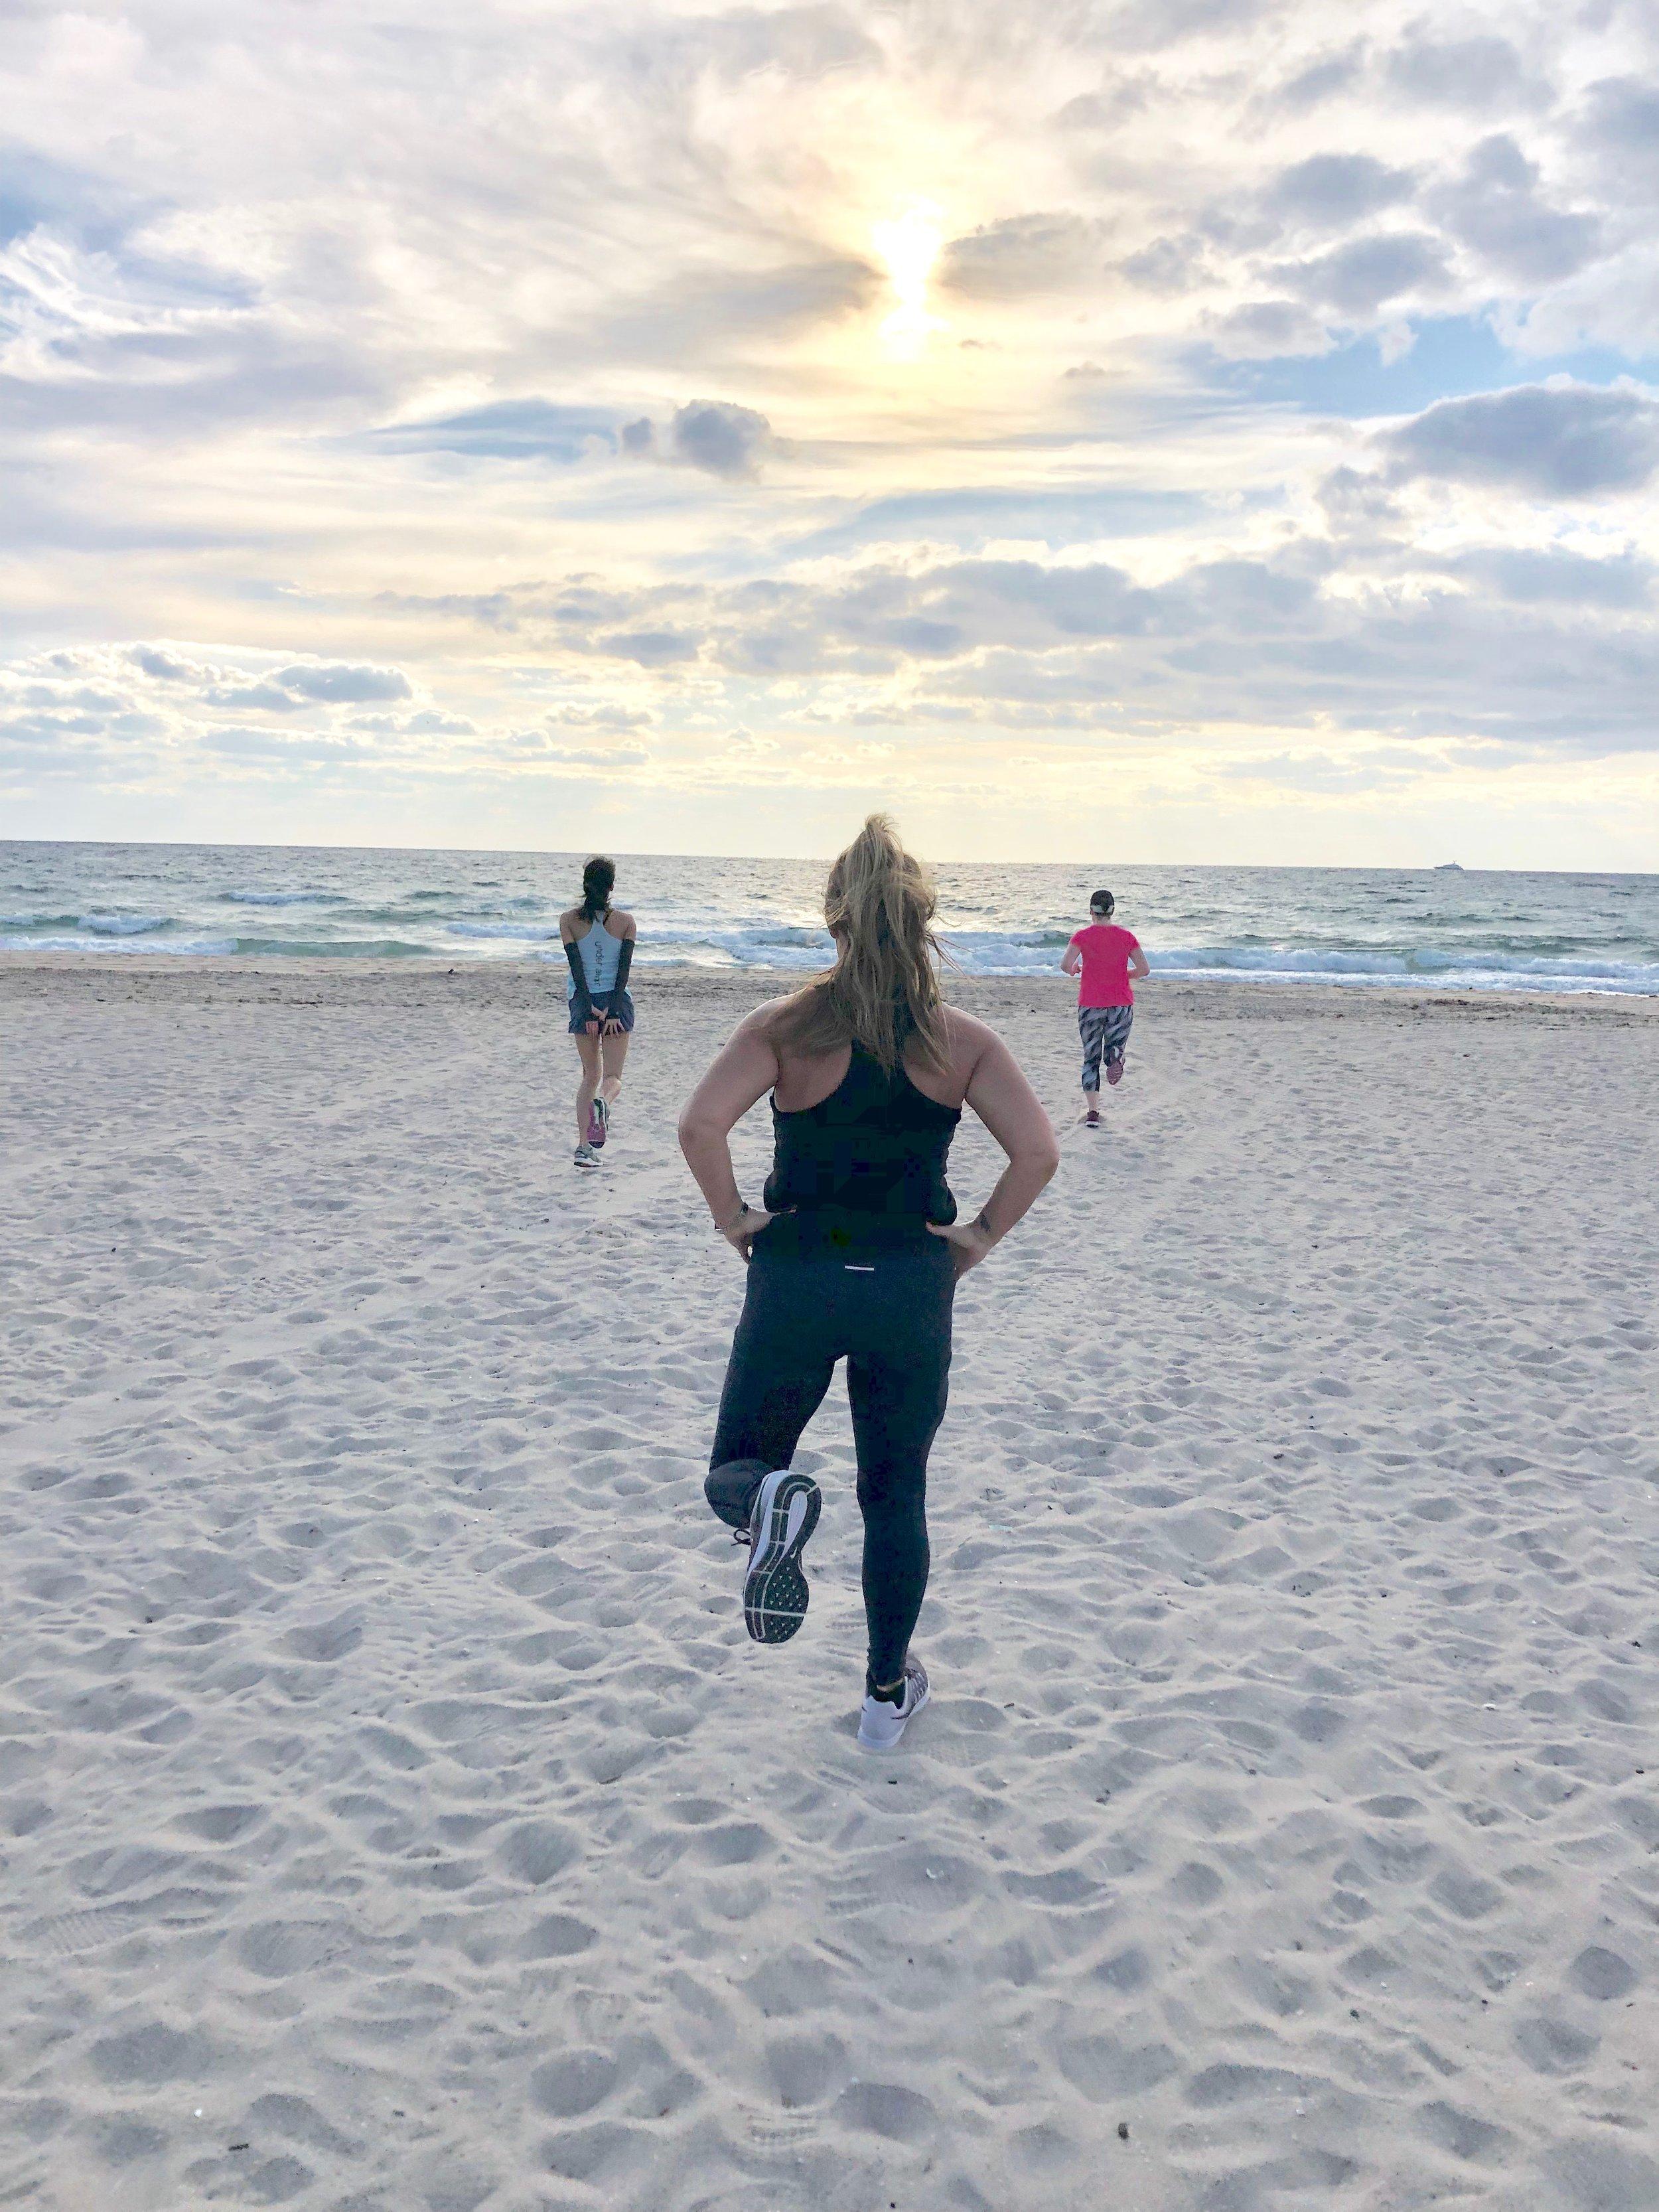 Retreat ladies do dynamic warm up on the beach.